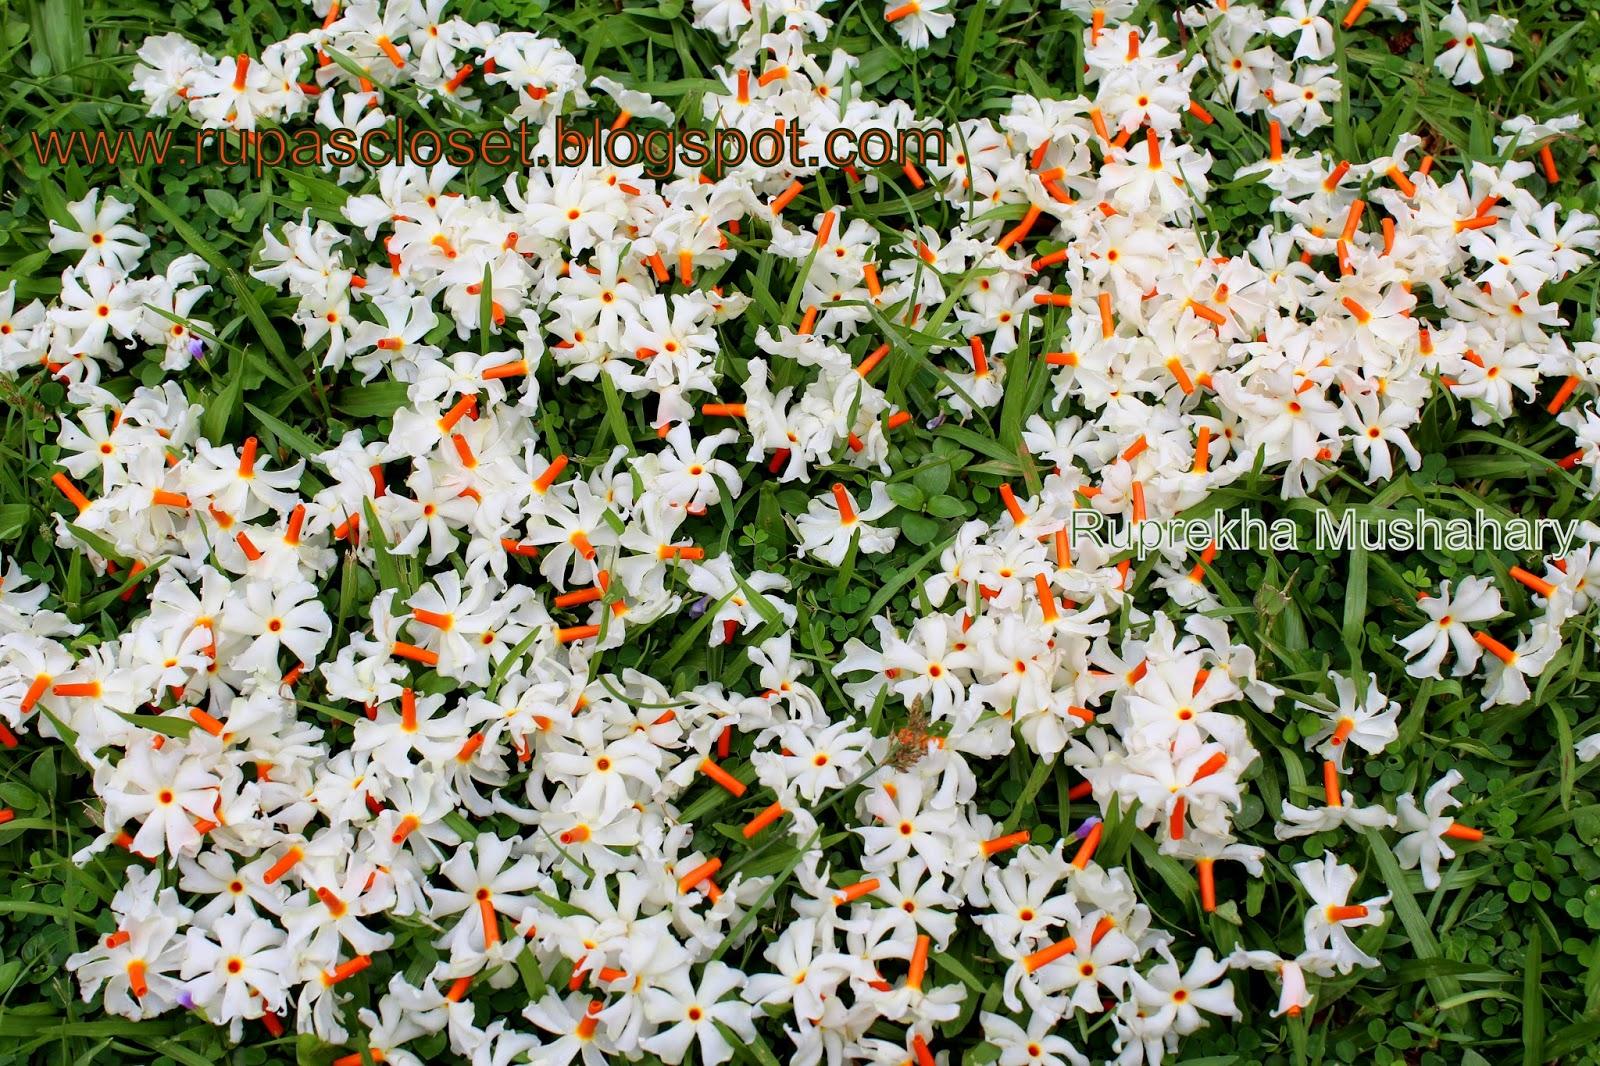 Malli Flower Name In English Flowers Online 2018 Flowers Online